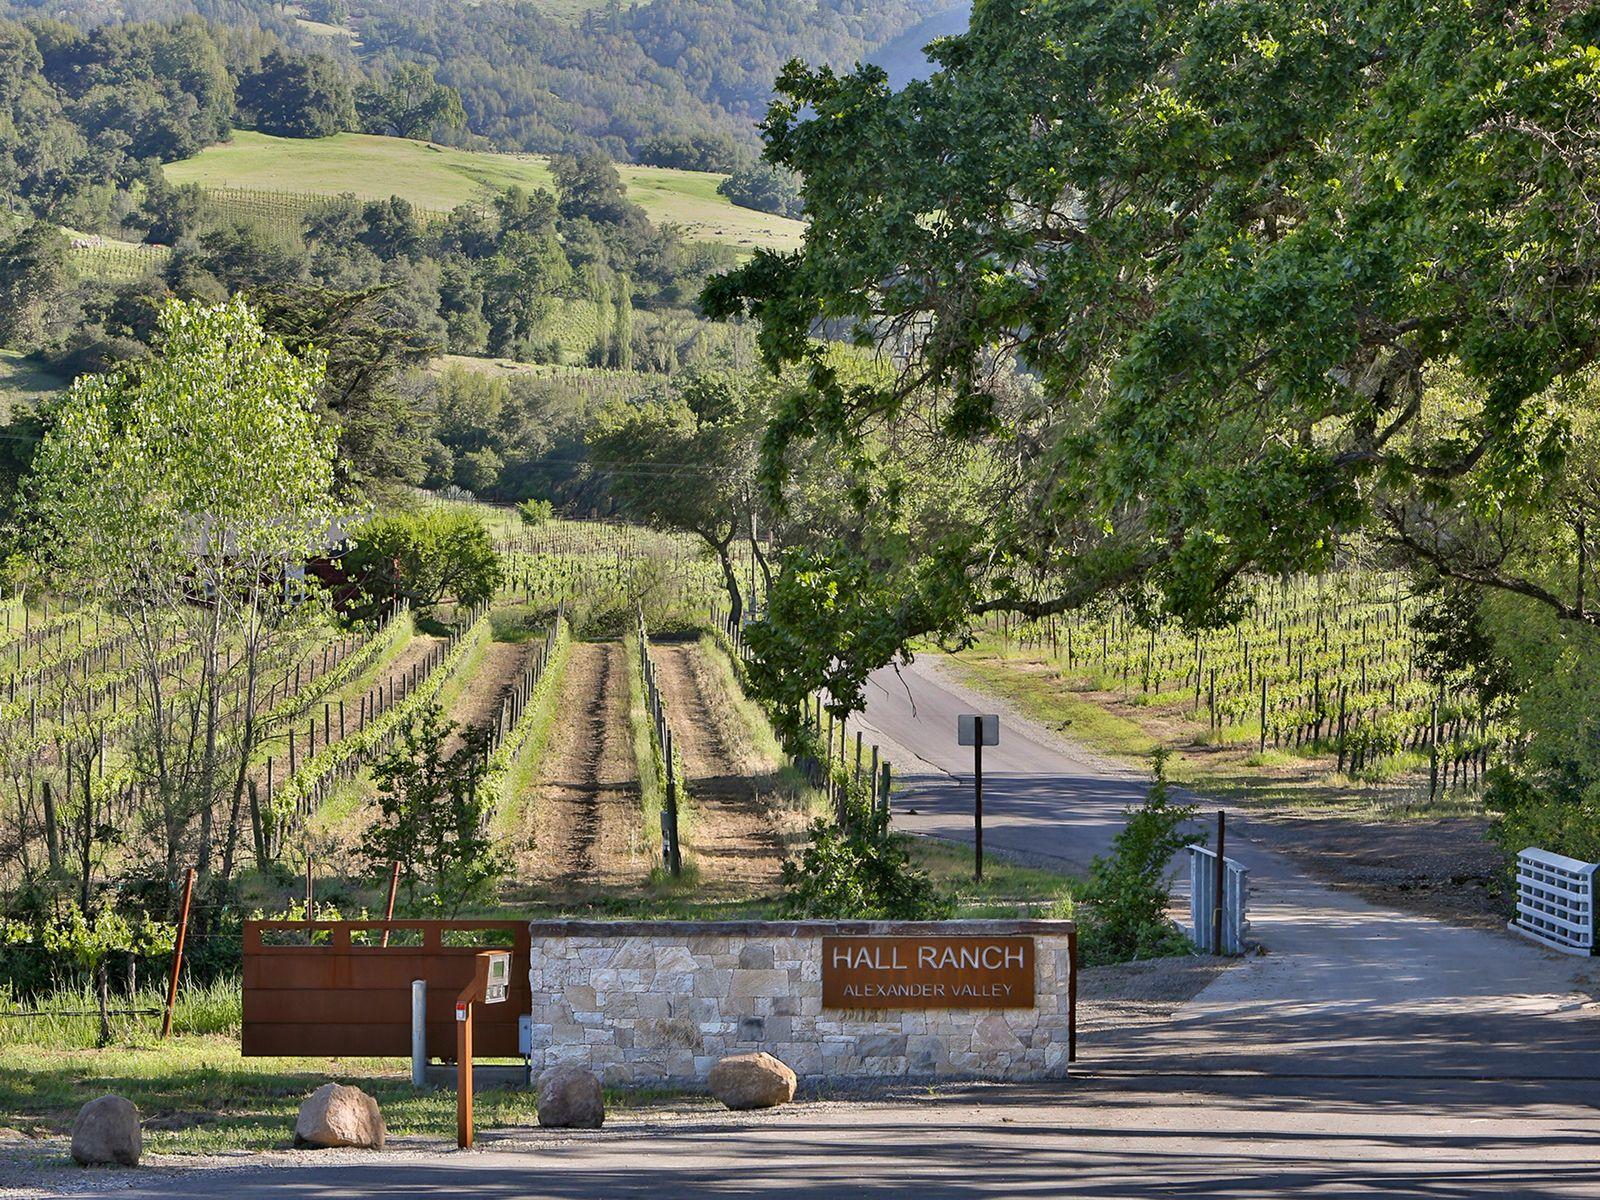 Hall Ranch, Alexander Valley